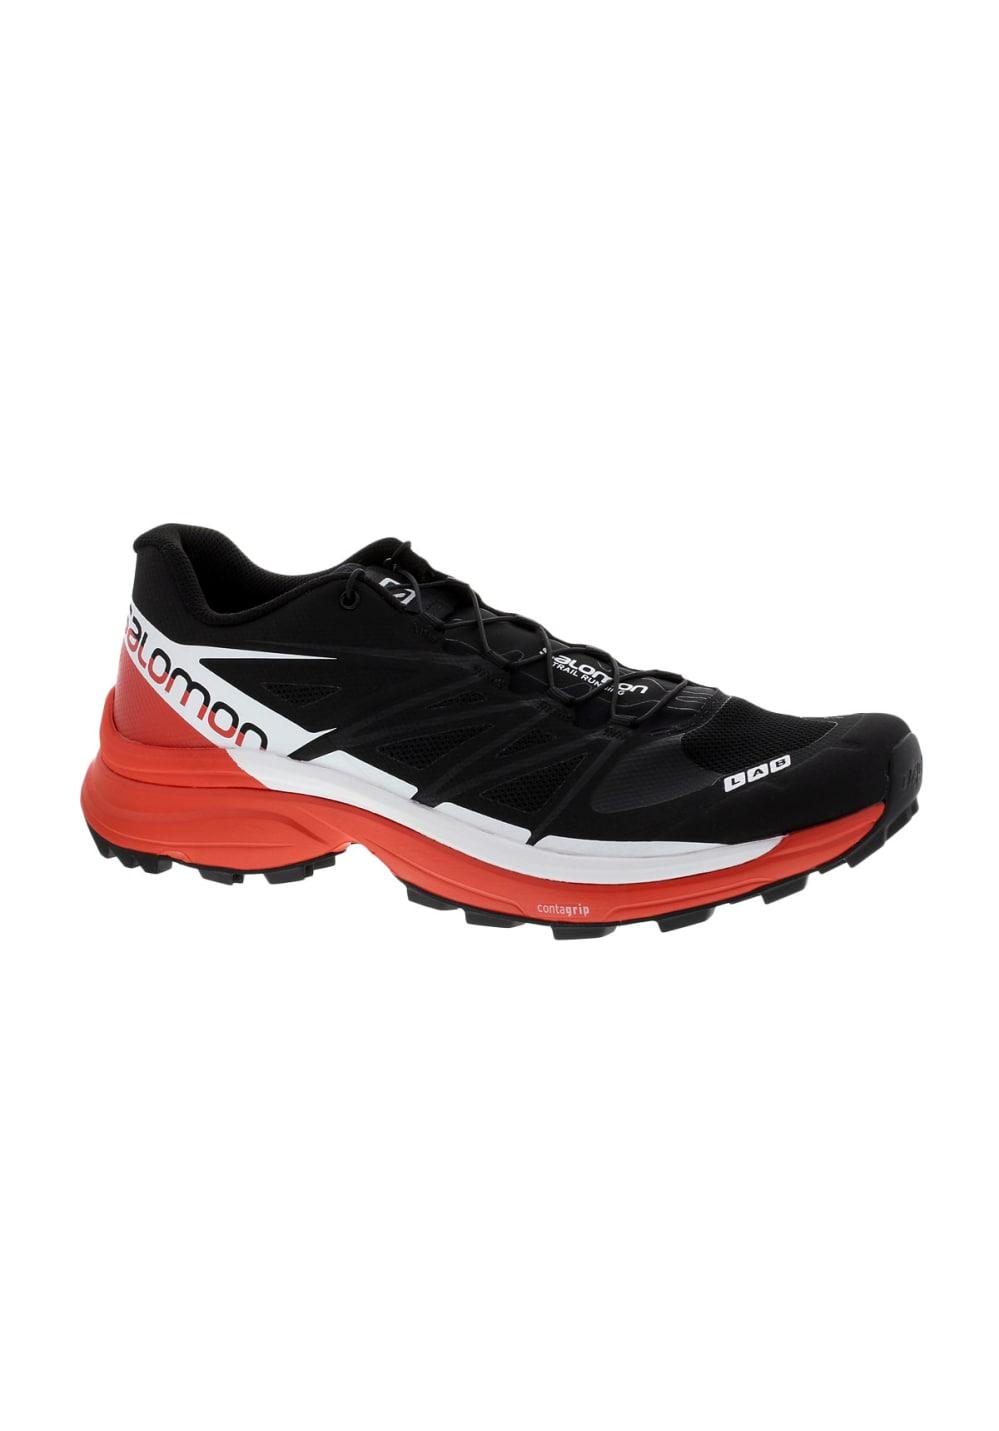 Sg Salomon Chaussures Noir Running Lab S 8 Wings trQhCsd